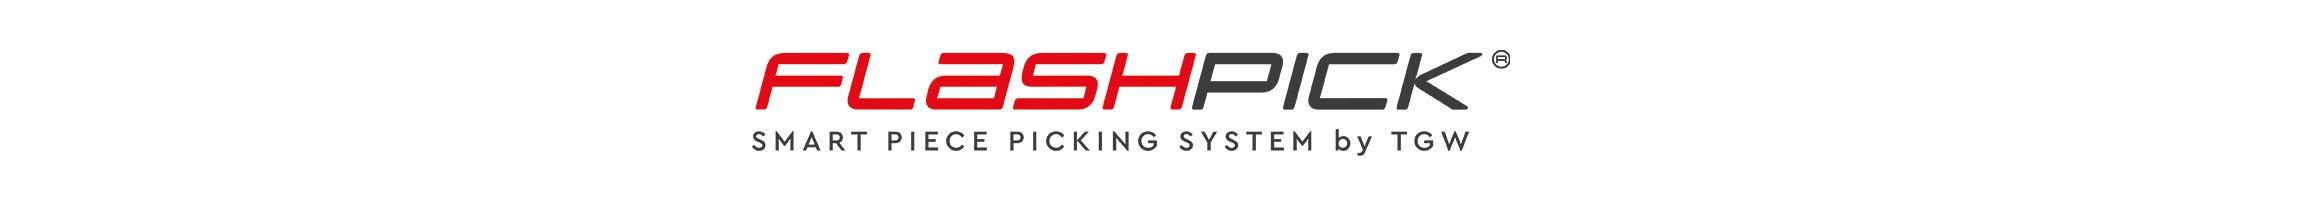 FlashPick® - Smart Piece Picking System by TGW